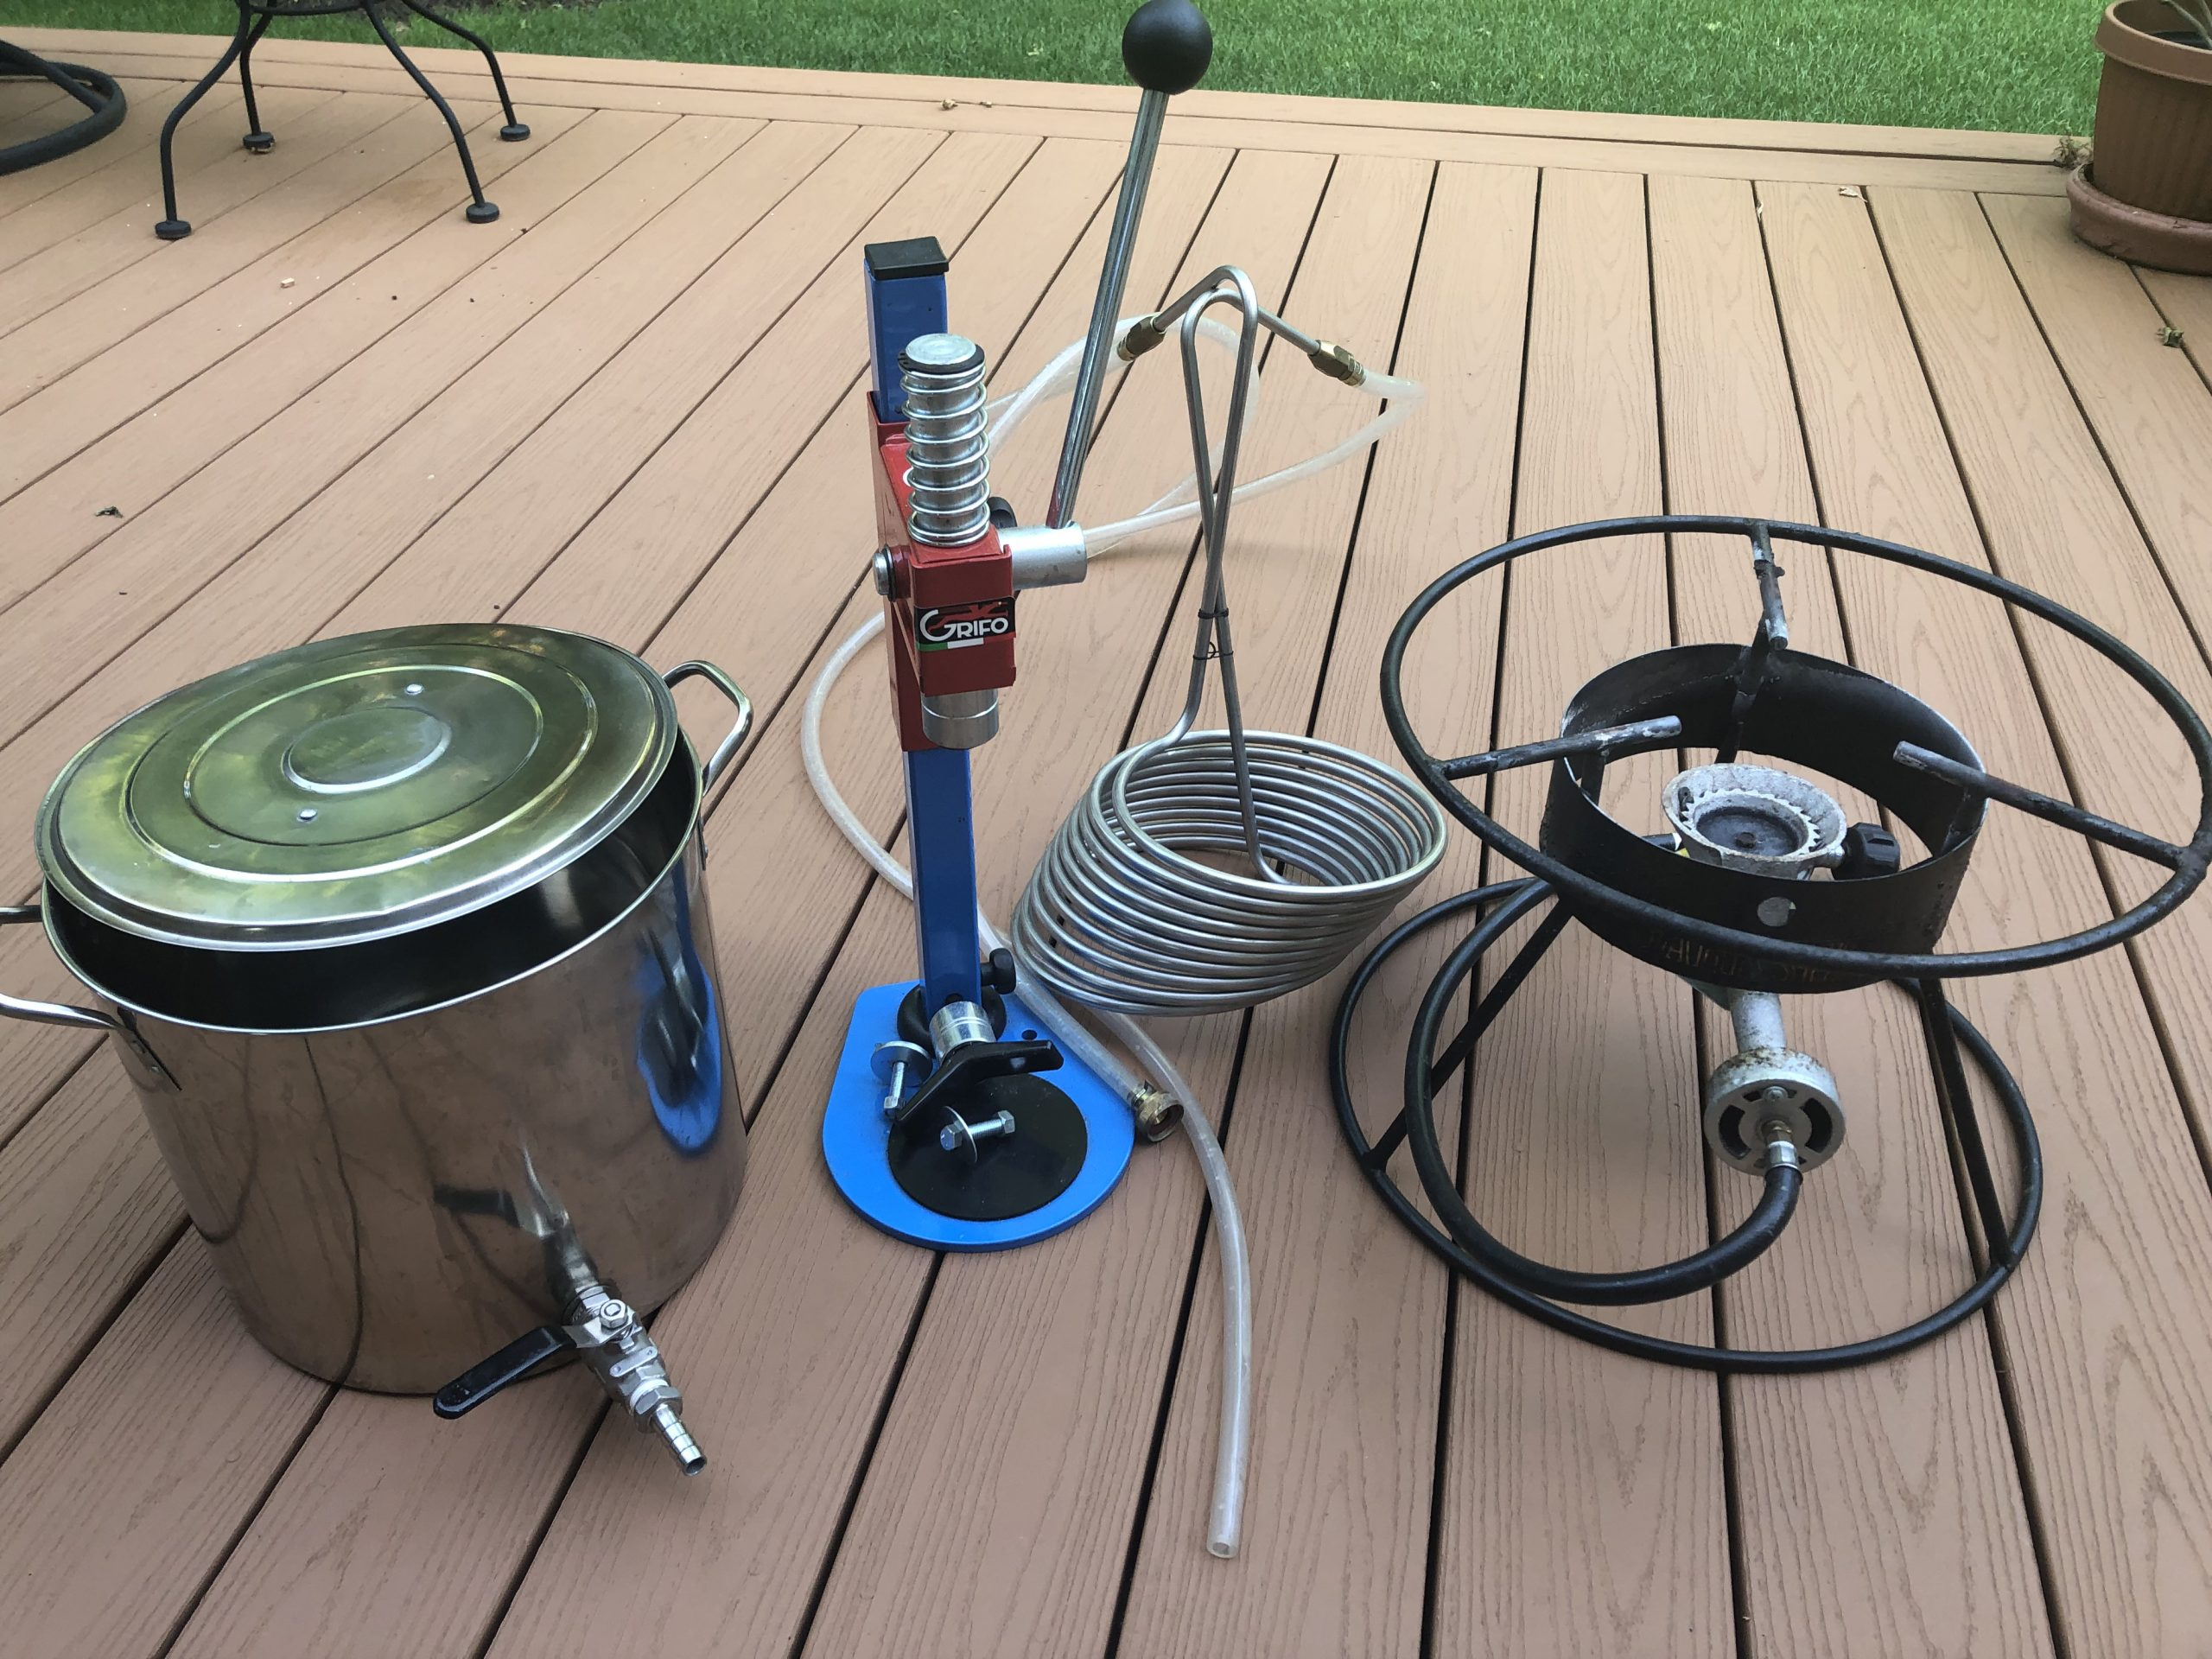 buying homebrewing equipment